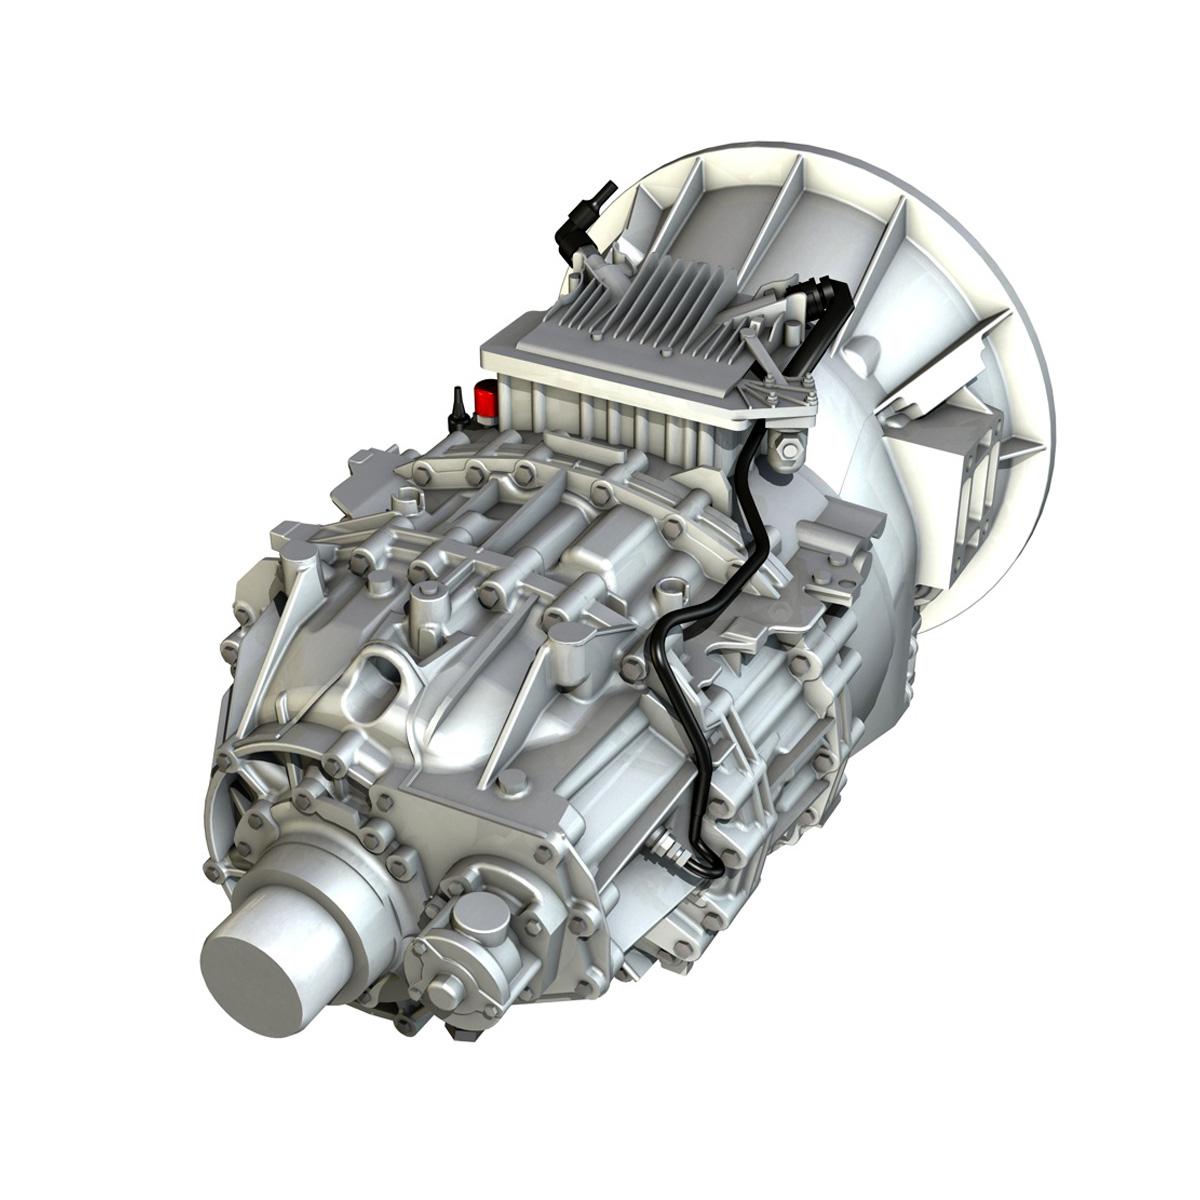 transmission 3d model 3ds c4d lwo obj 263908